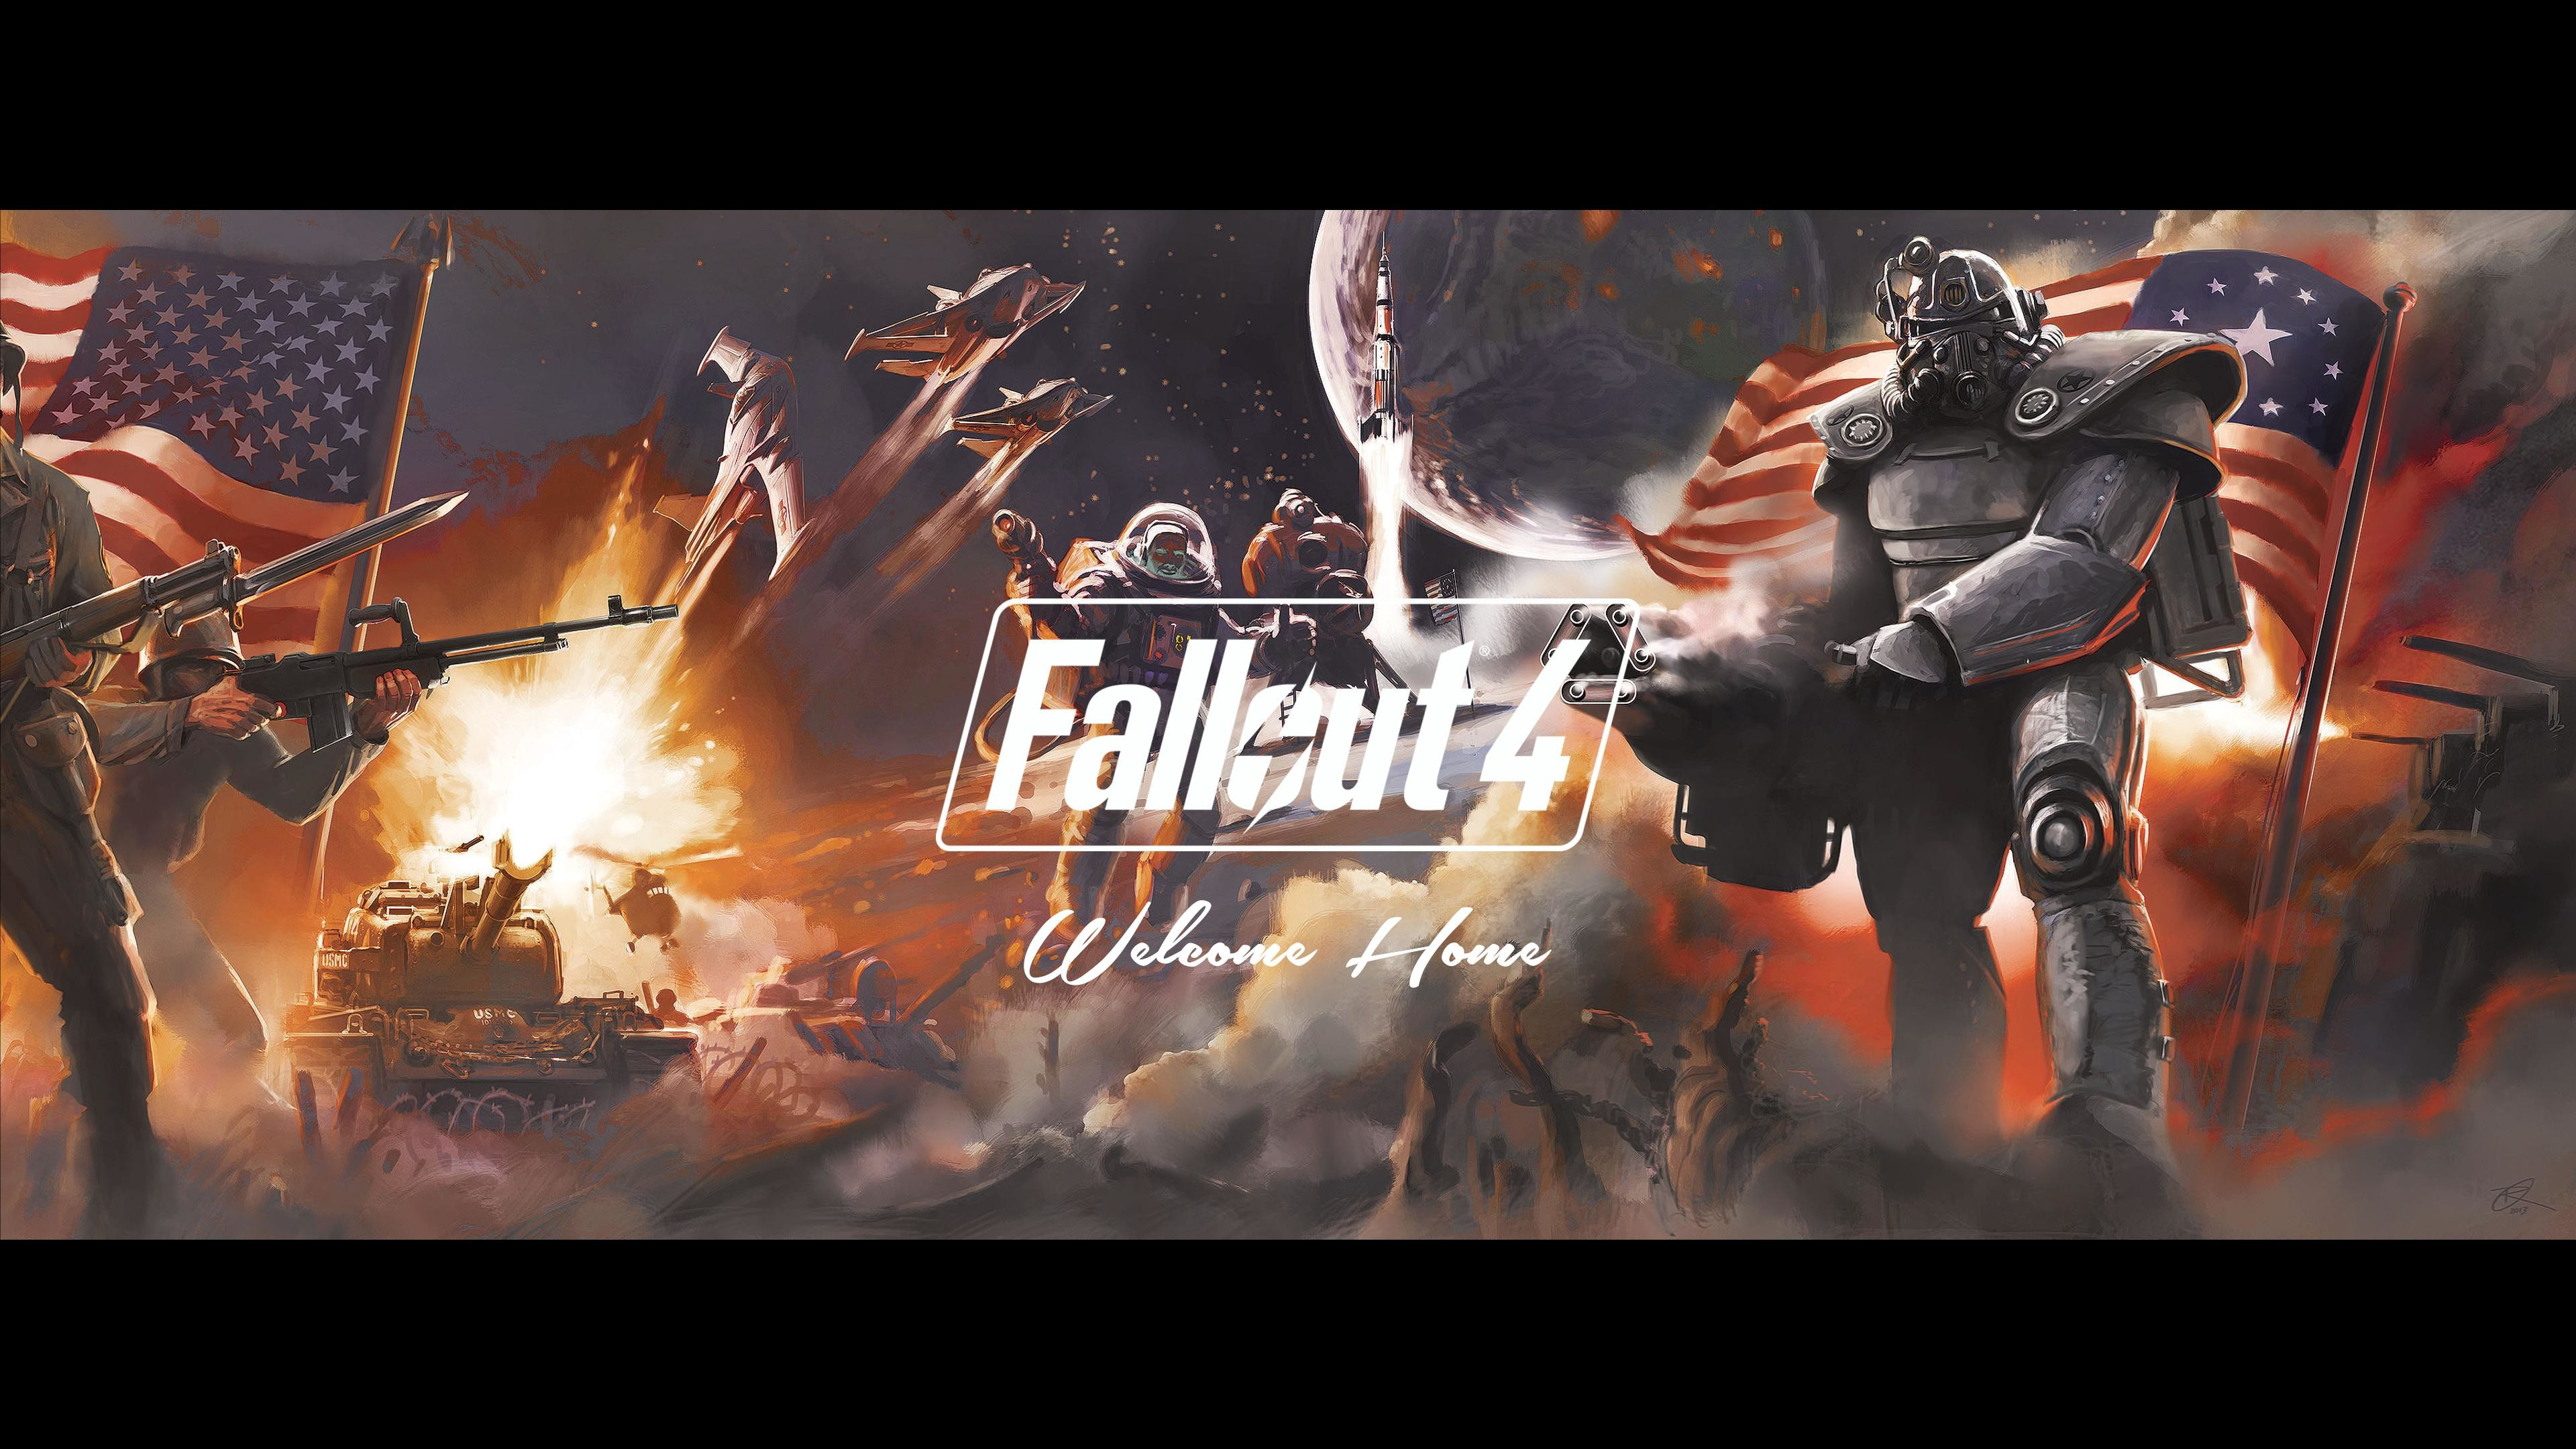 Fallout 4 Desktop Wallpaper 76 Images